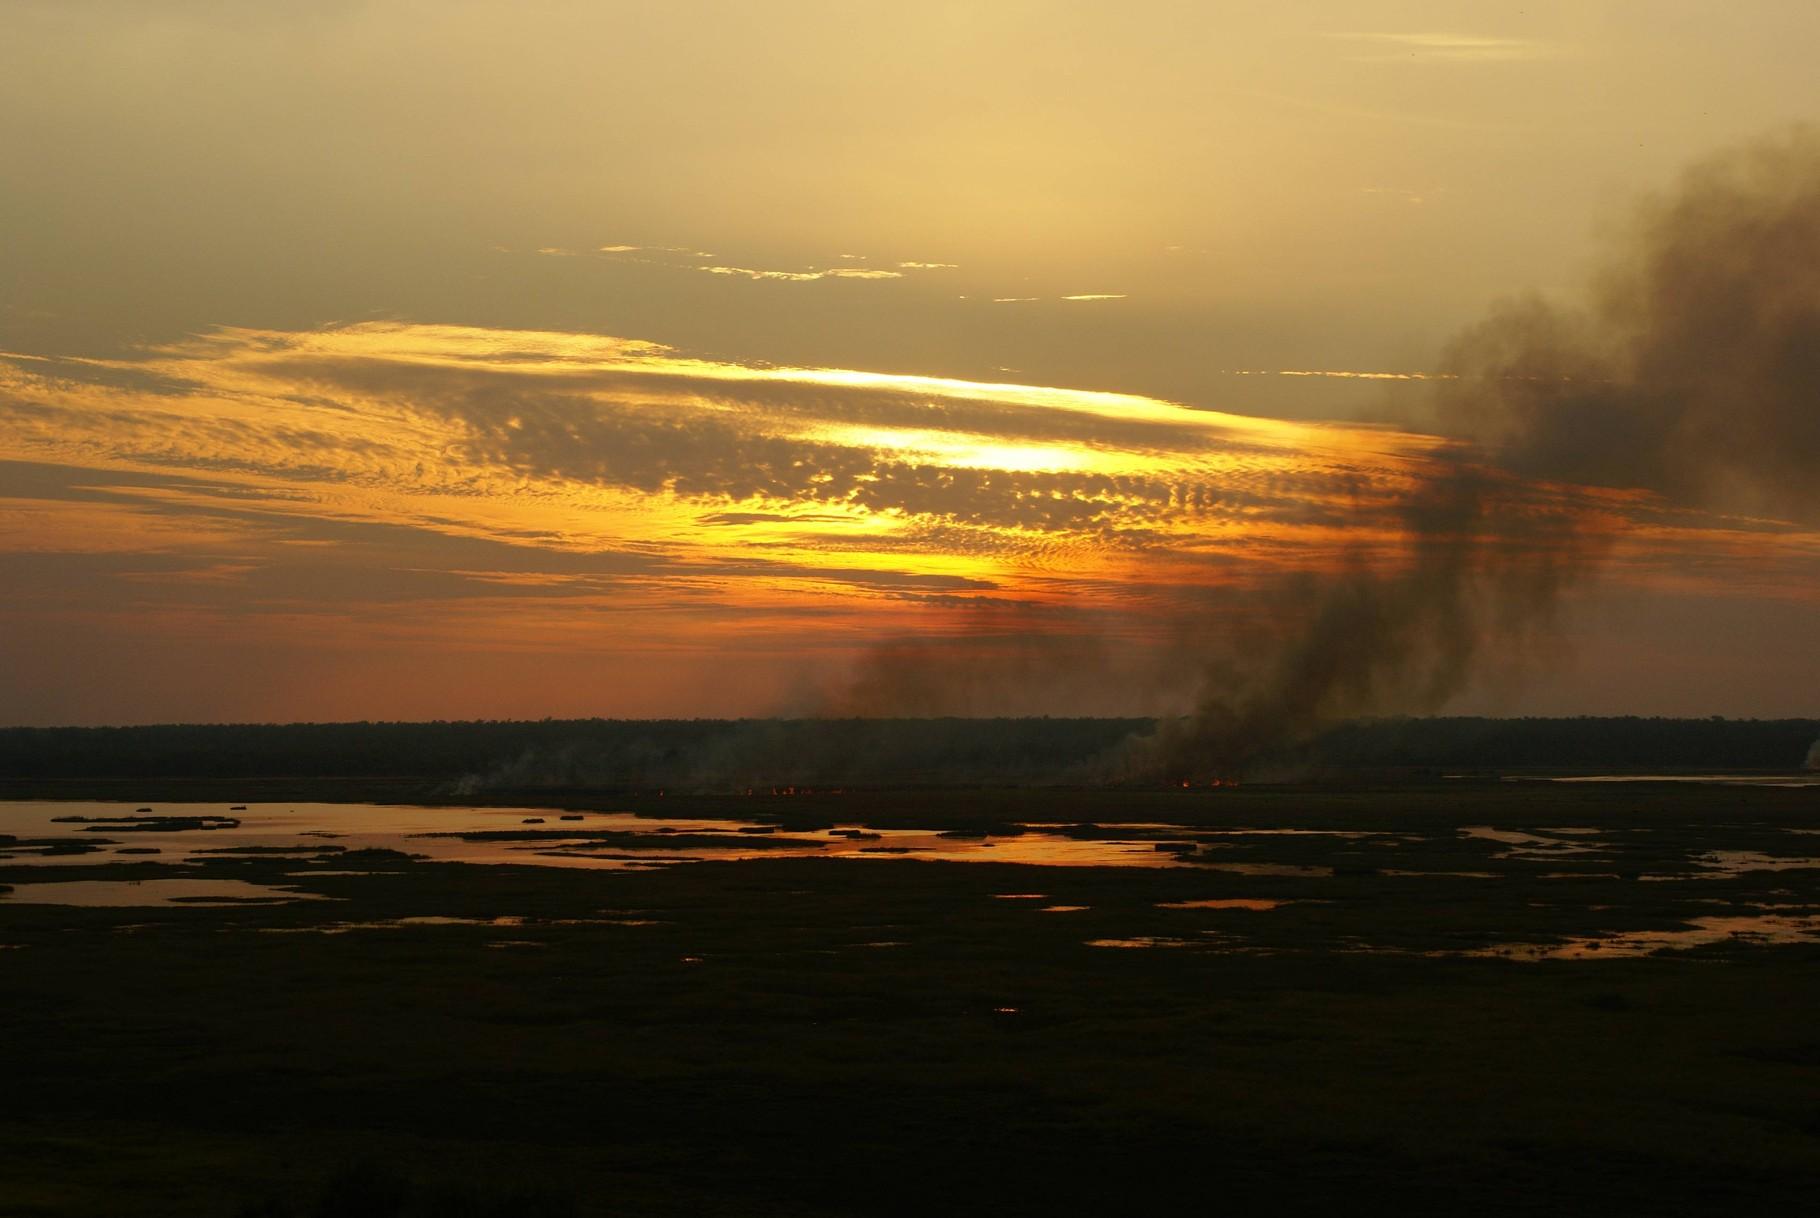 Sonnenuntergang im Kakadu NP, Northern Territory